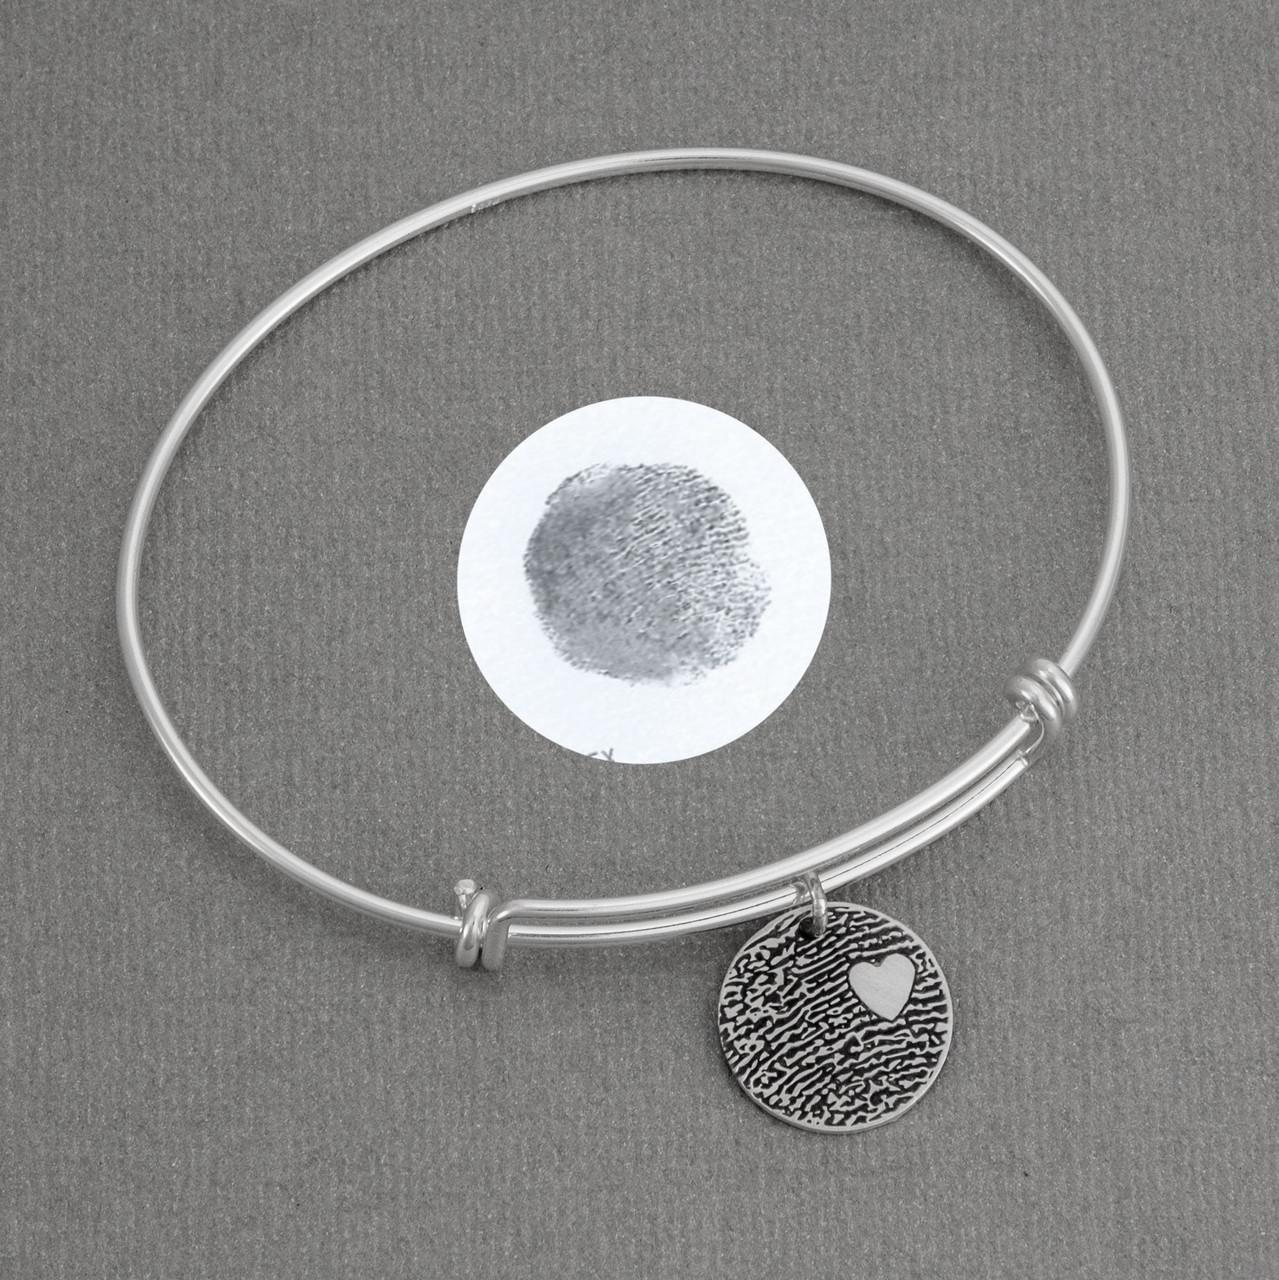 Expandable sterling silver bracelet with custom fingerprint pendant, shown with original fingerprint